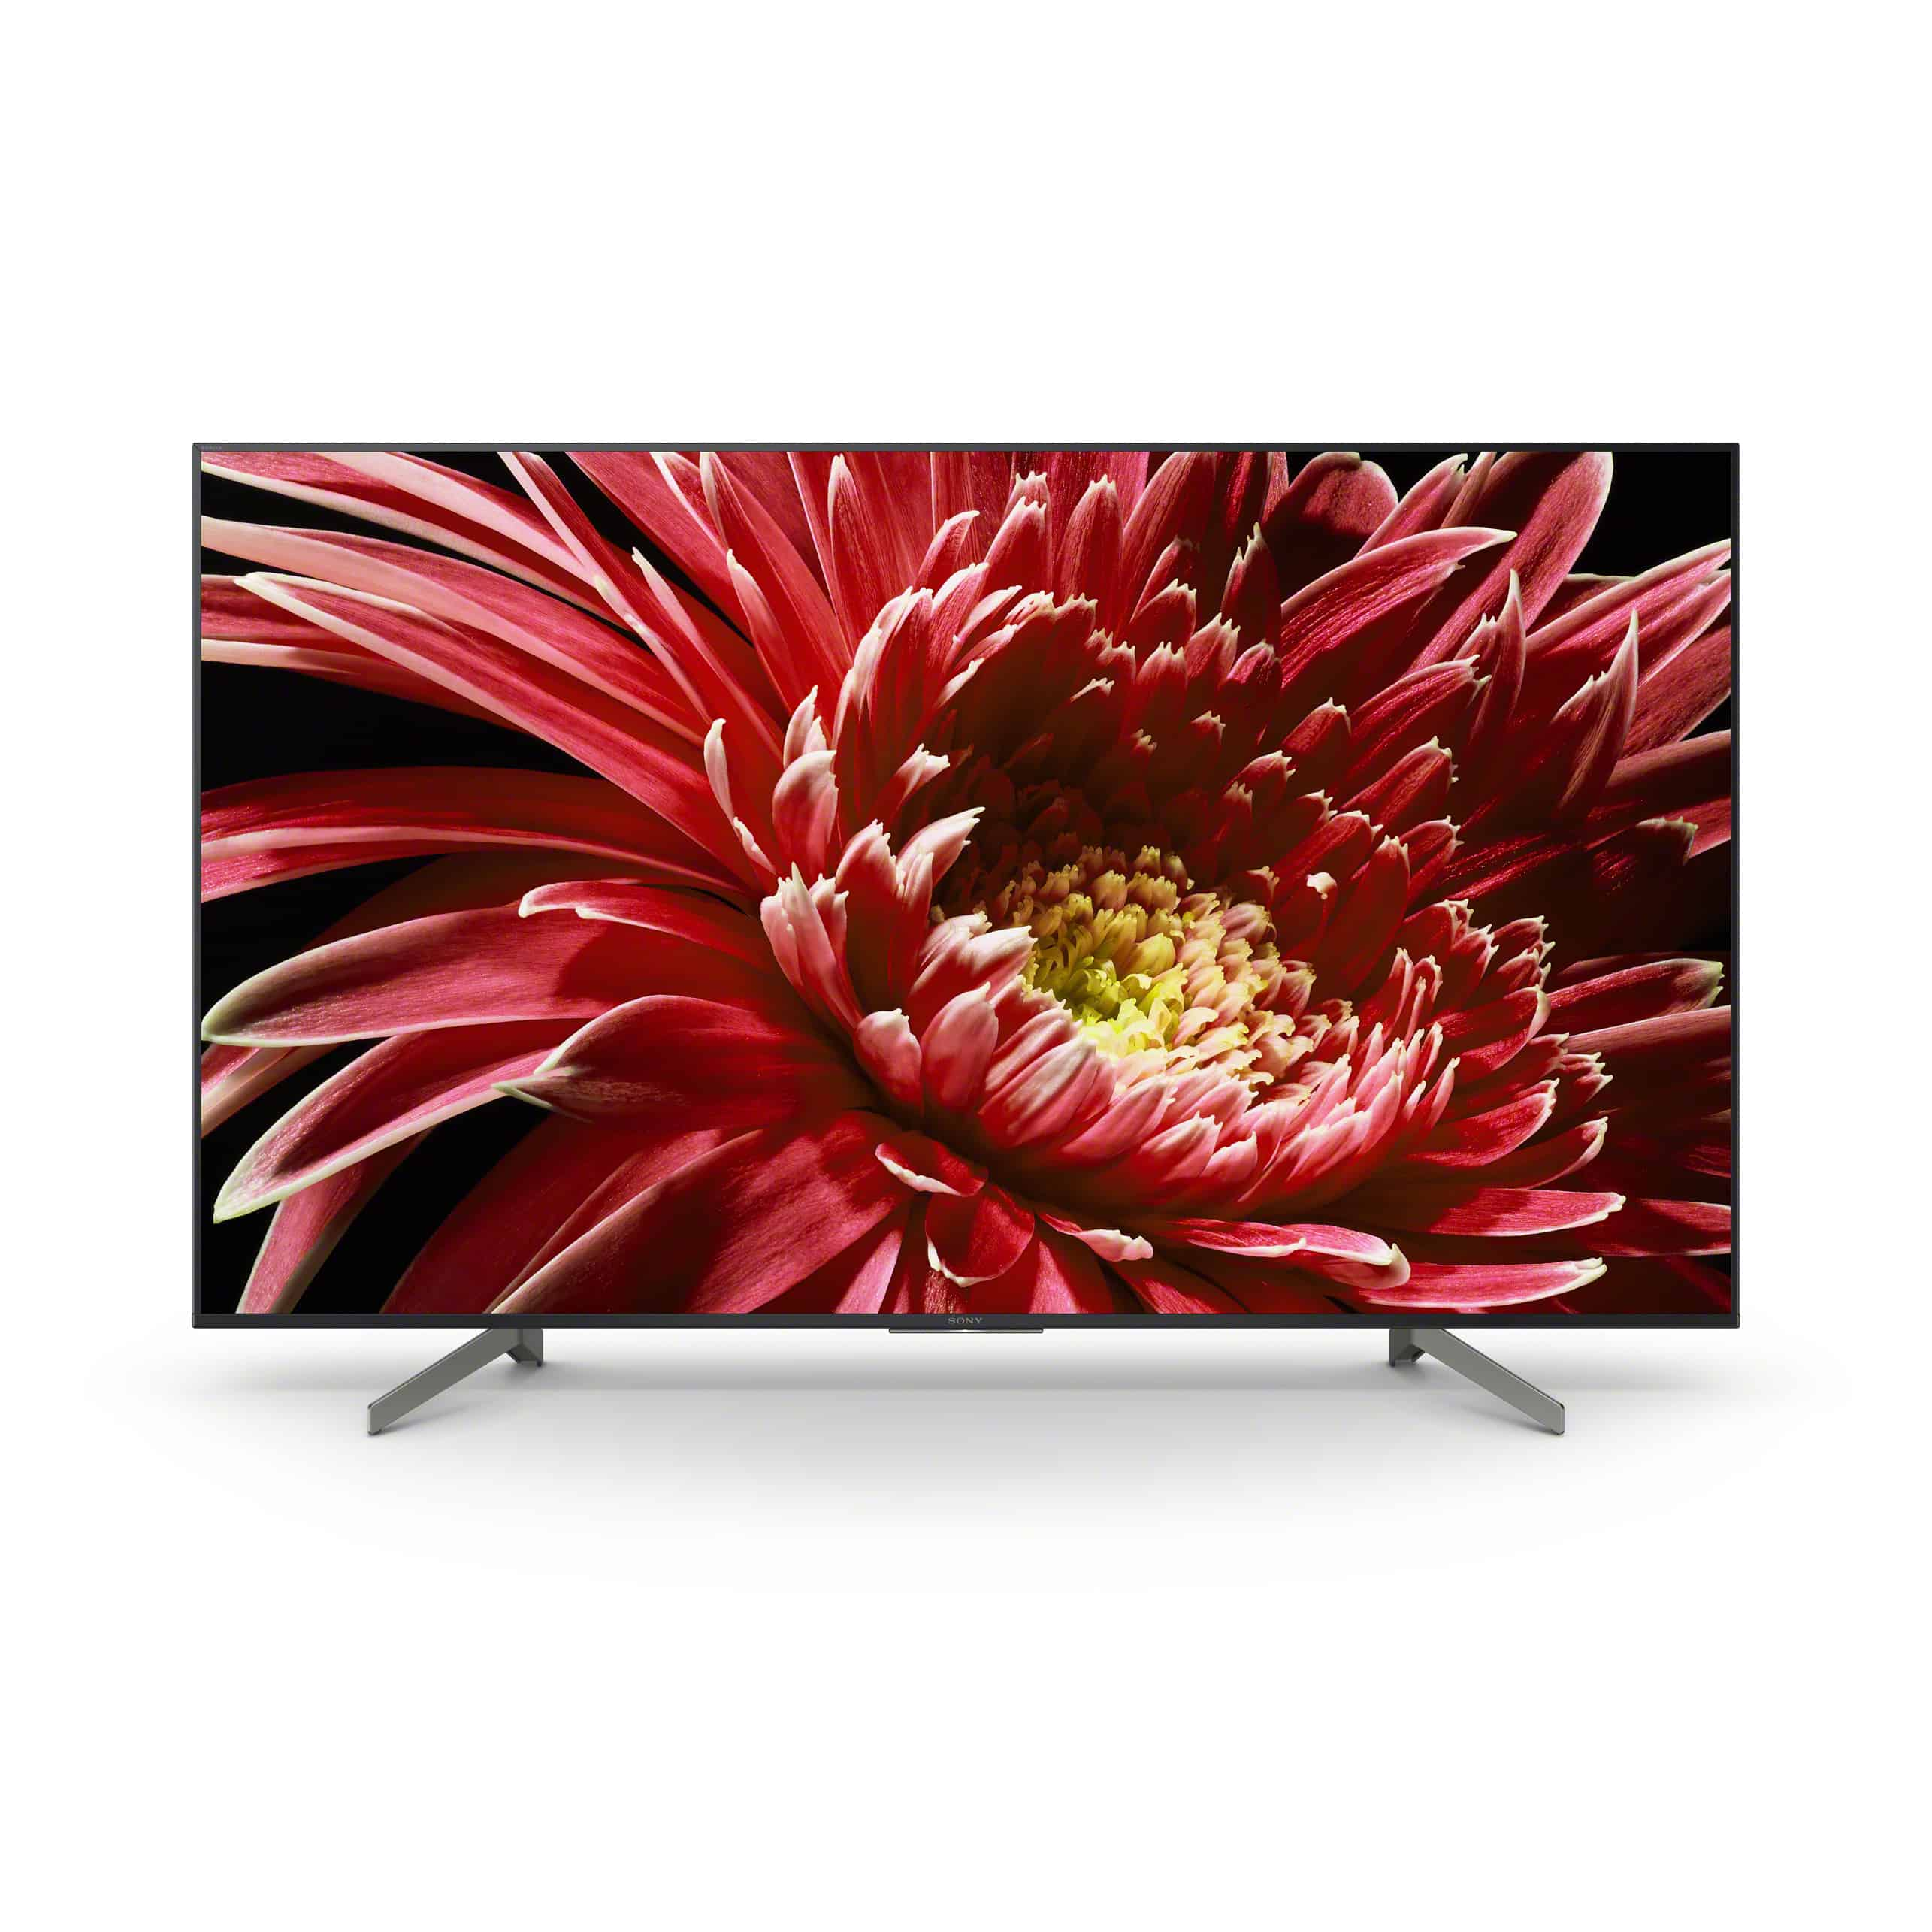 Tv 85 Zoll : 4k uhd led smart tv kd85xg8596baep 85 zoll pr mie direkt ~ Watch28wear.com Haus und Dekorationen